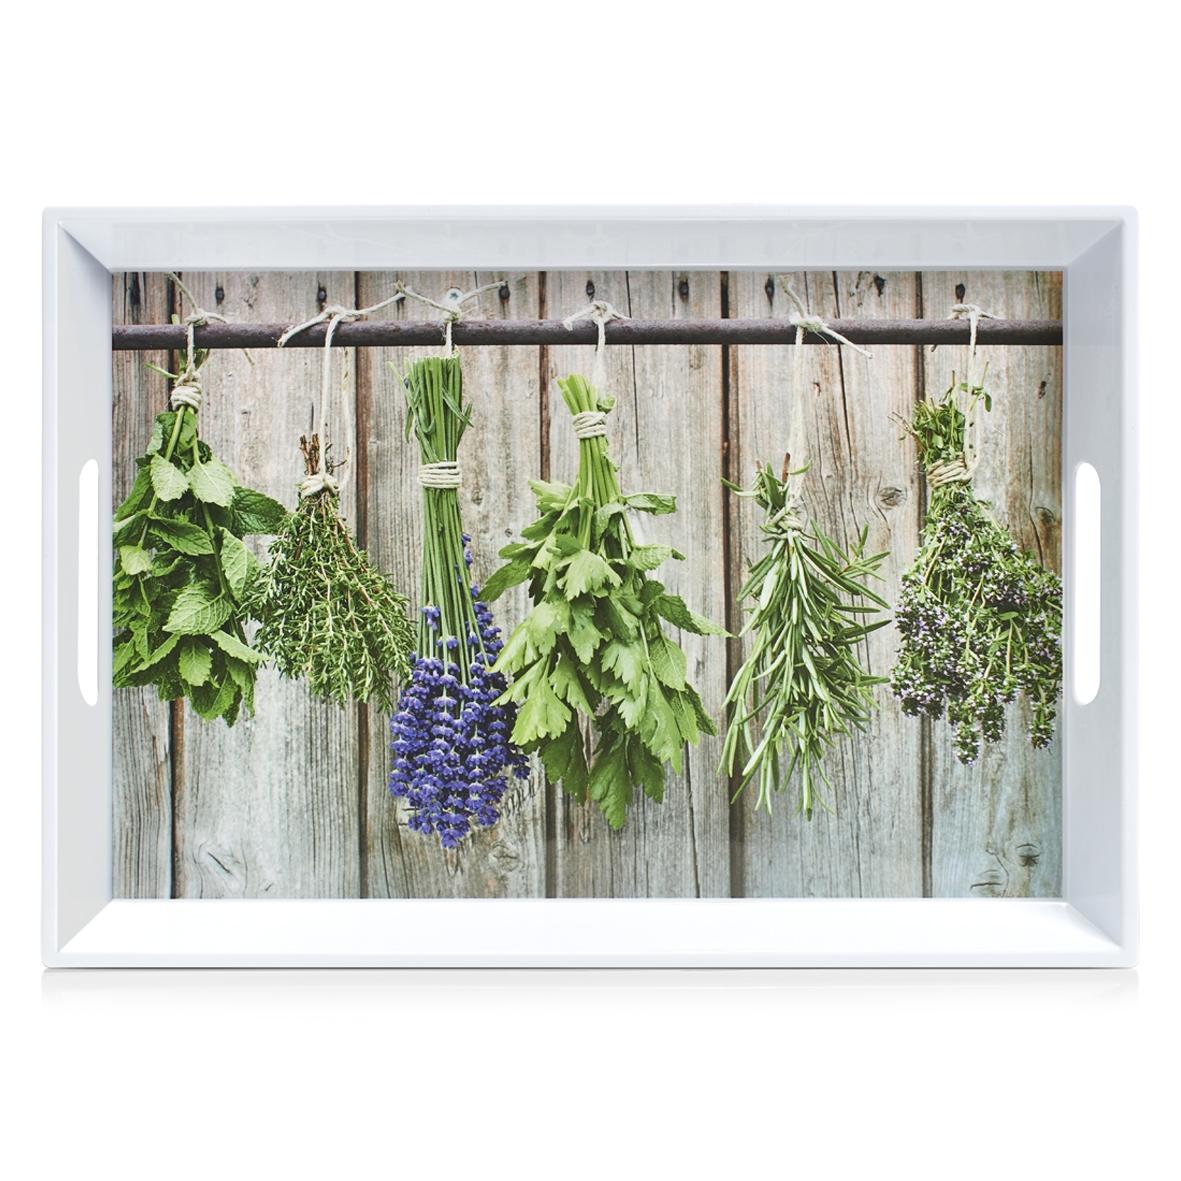 Tava pentru servire Herbs, Melamina Multicolor, l50xA35xH5 cm imagine